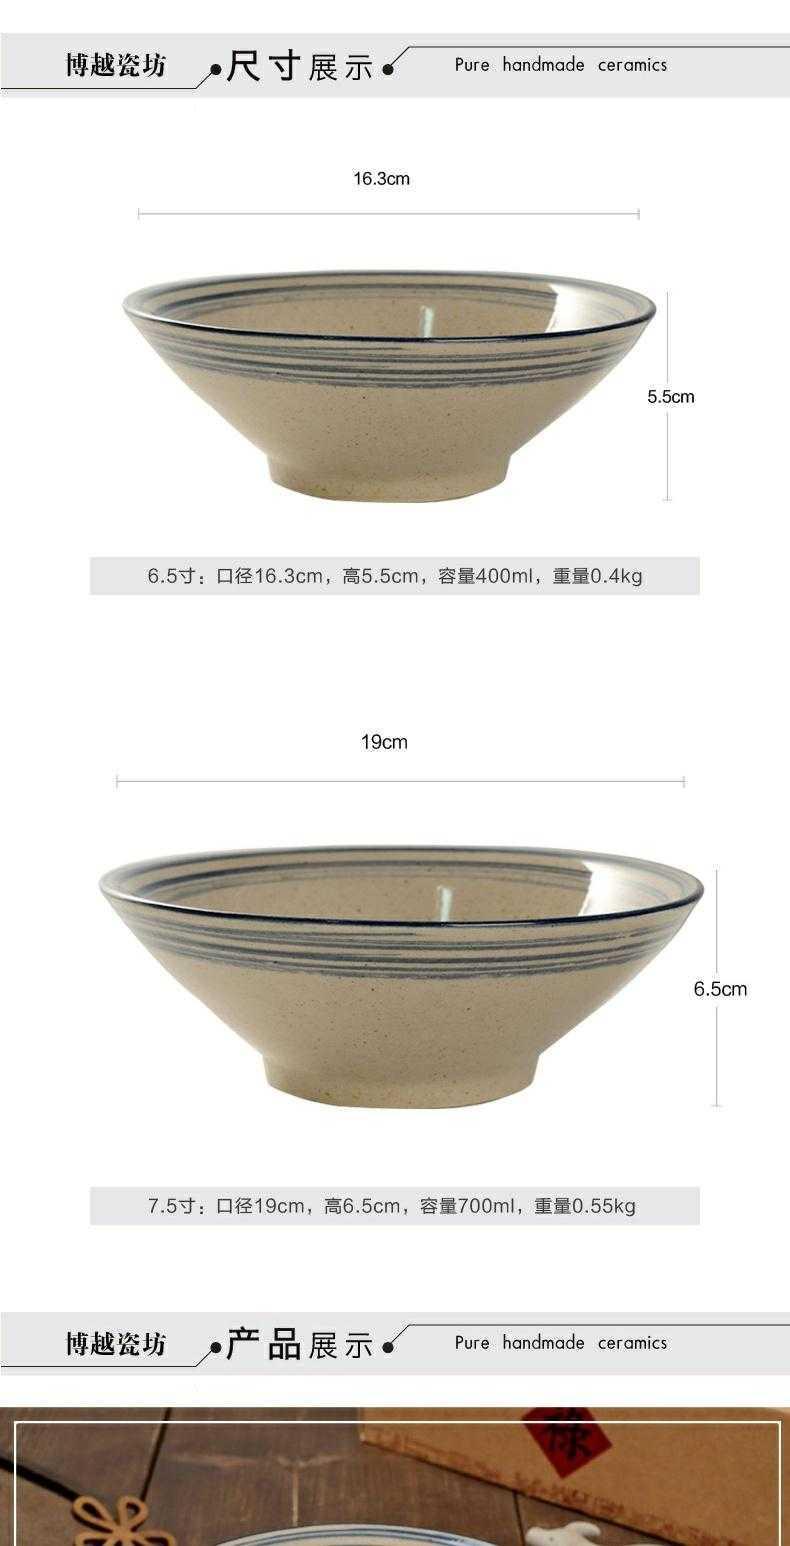 Inch ceramic blue edge ramen bowl fights nostalgic restaurant bowl of bowls home soil single 6 ltd. rainbow such use 7 hat to the old